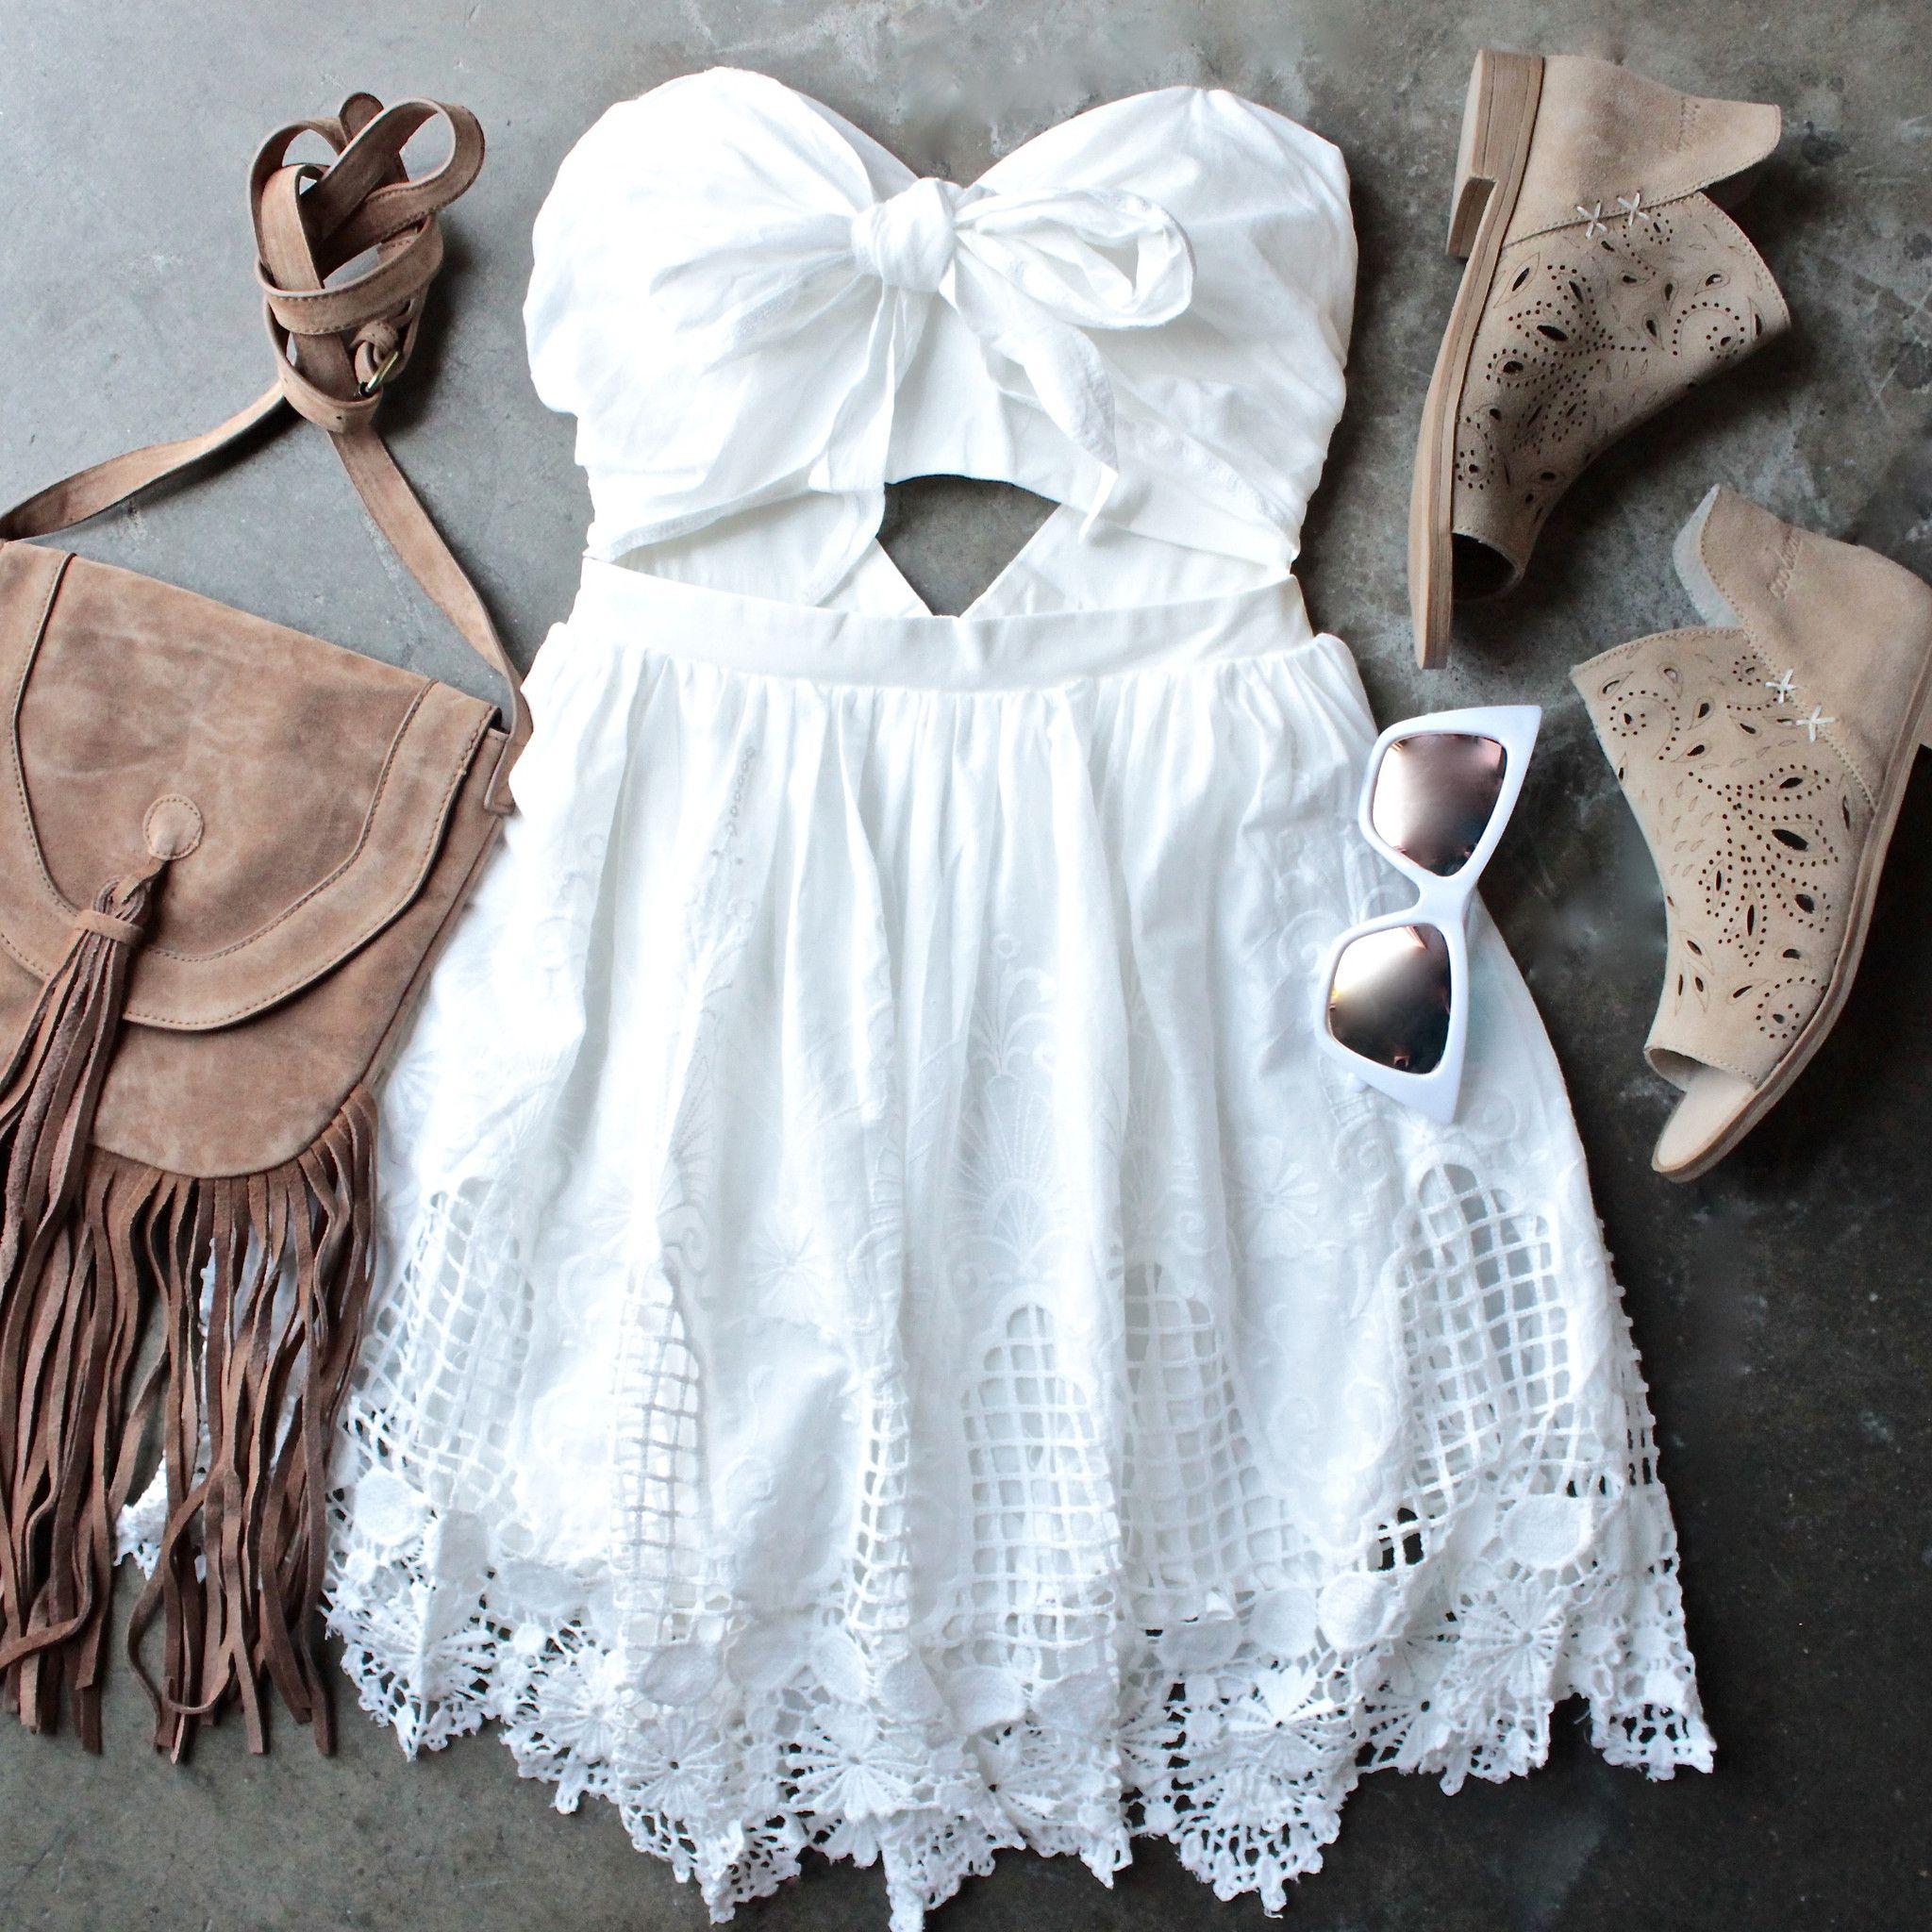 Ribbon tie white crochet summer dress crochet summer summer